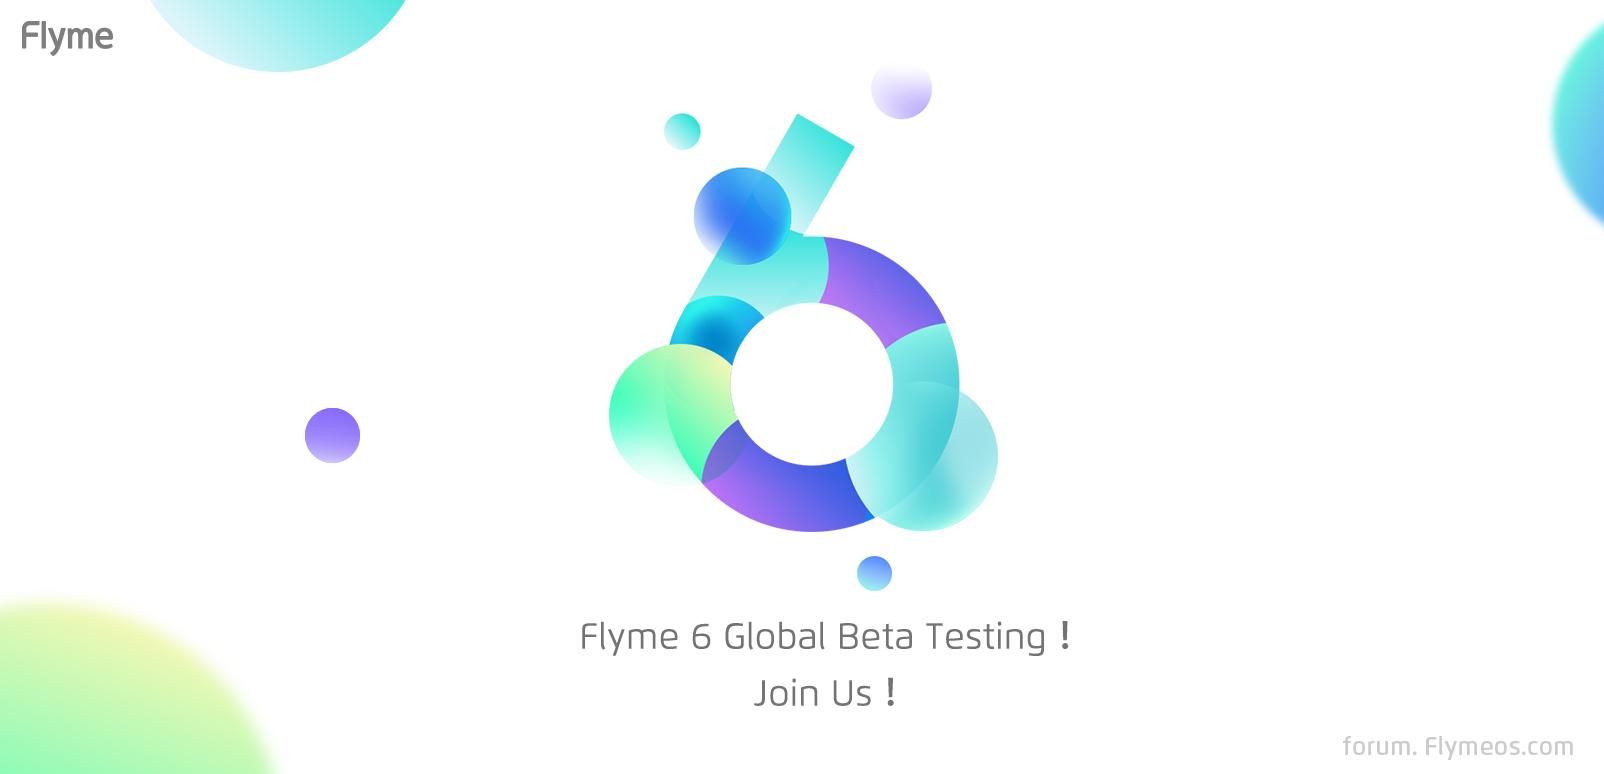 meizu flyme 6 teste beta global